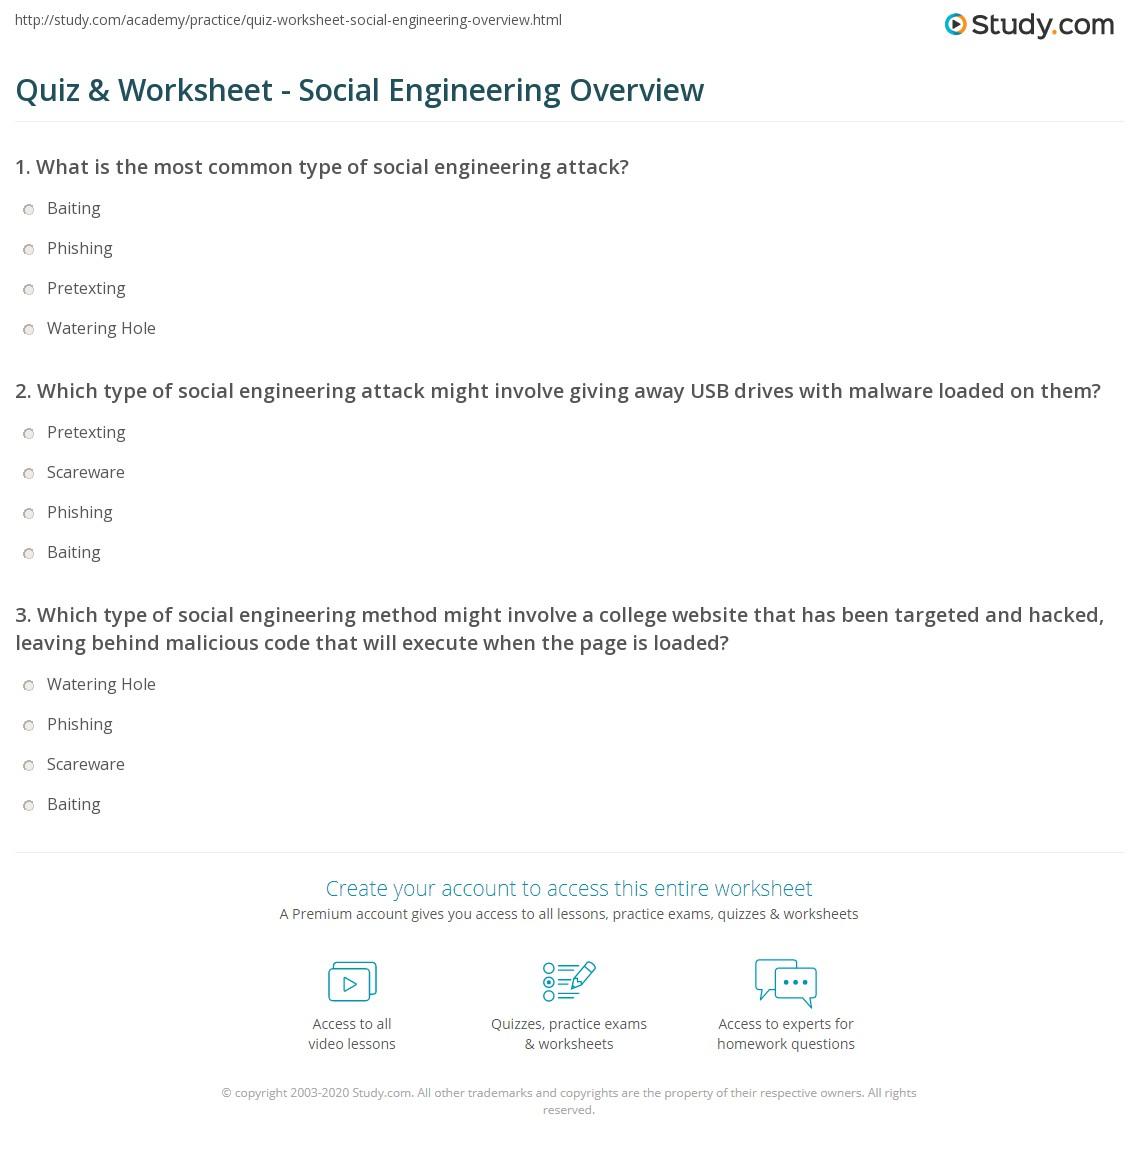 quiz & worksheet - social engineering overview | study